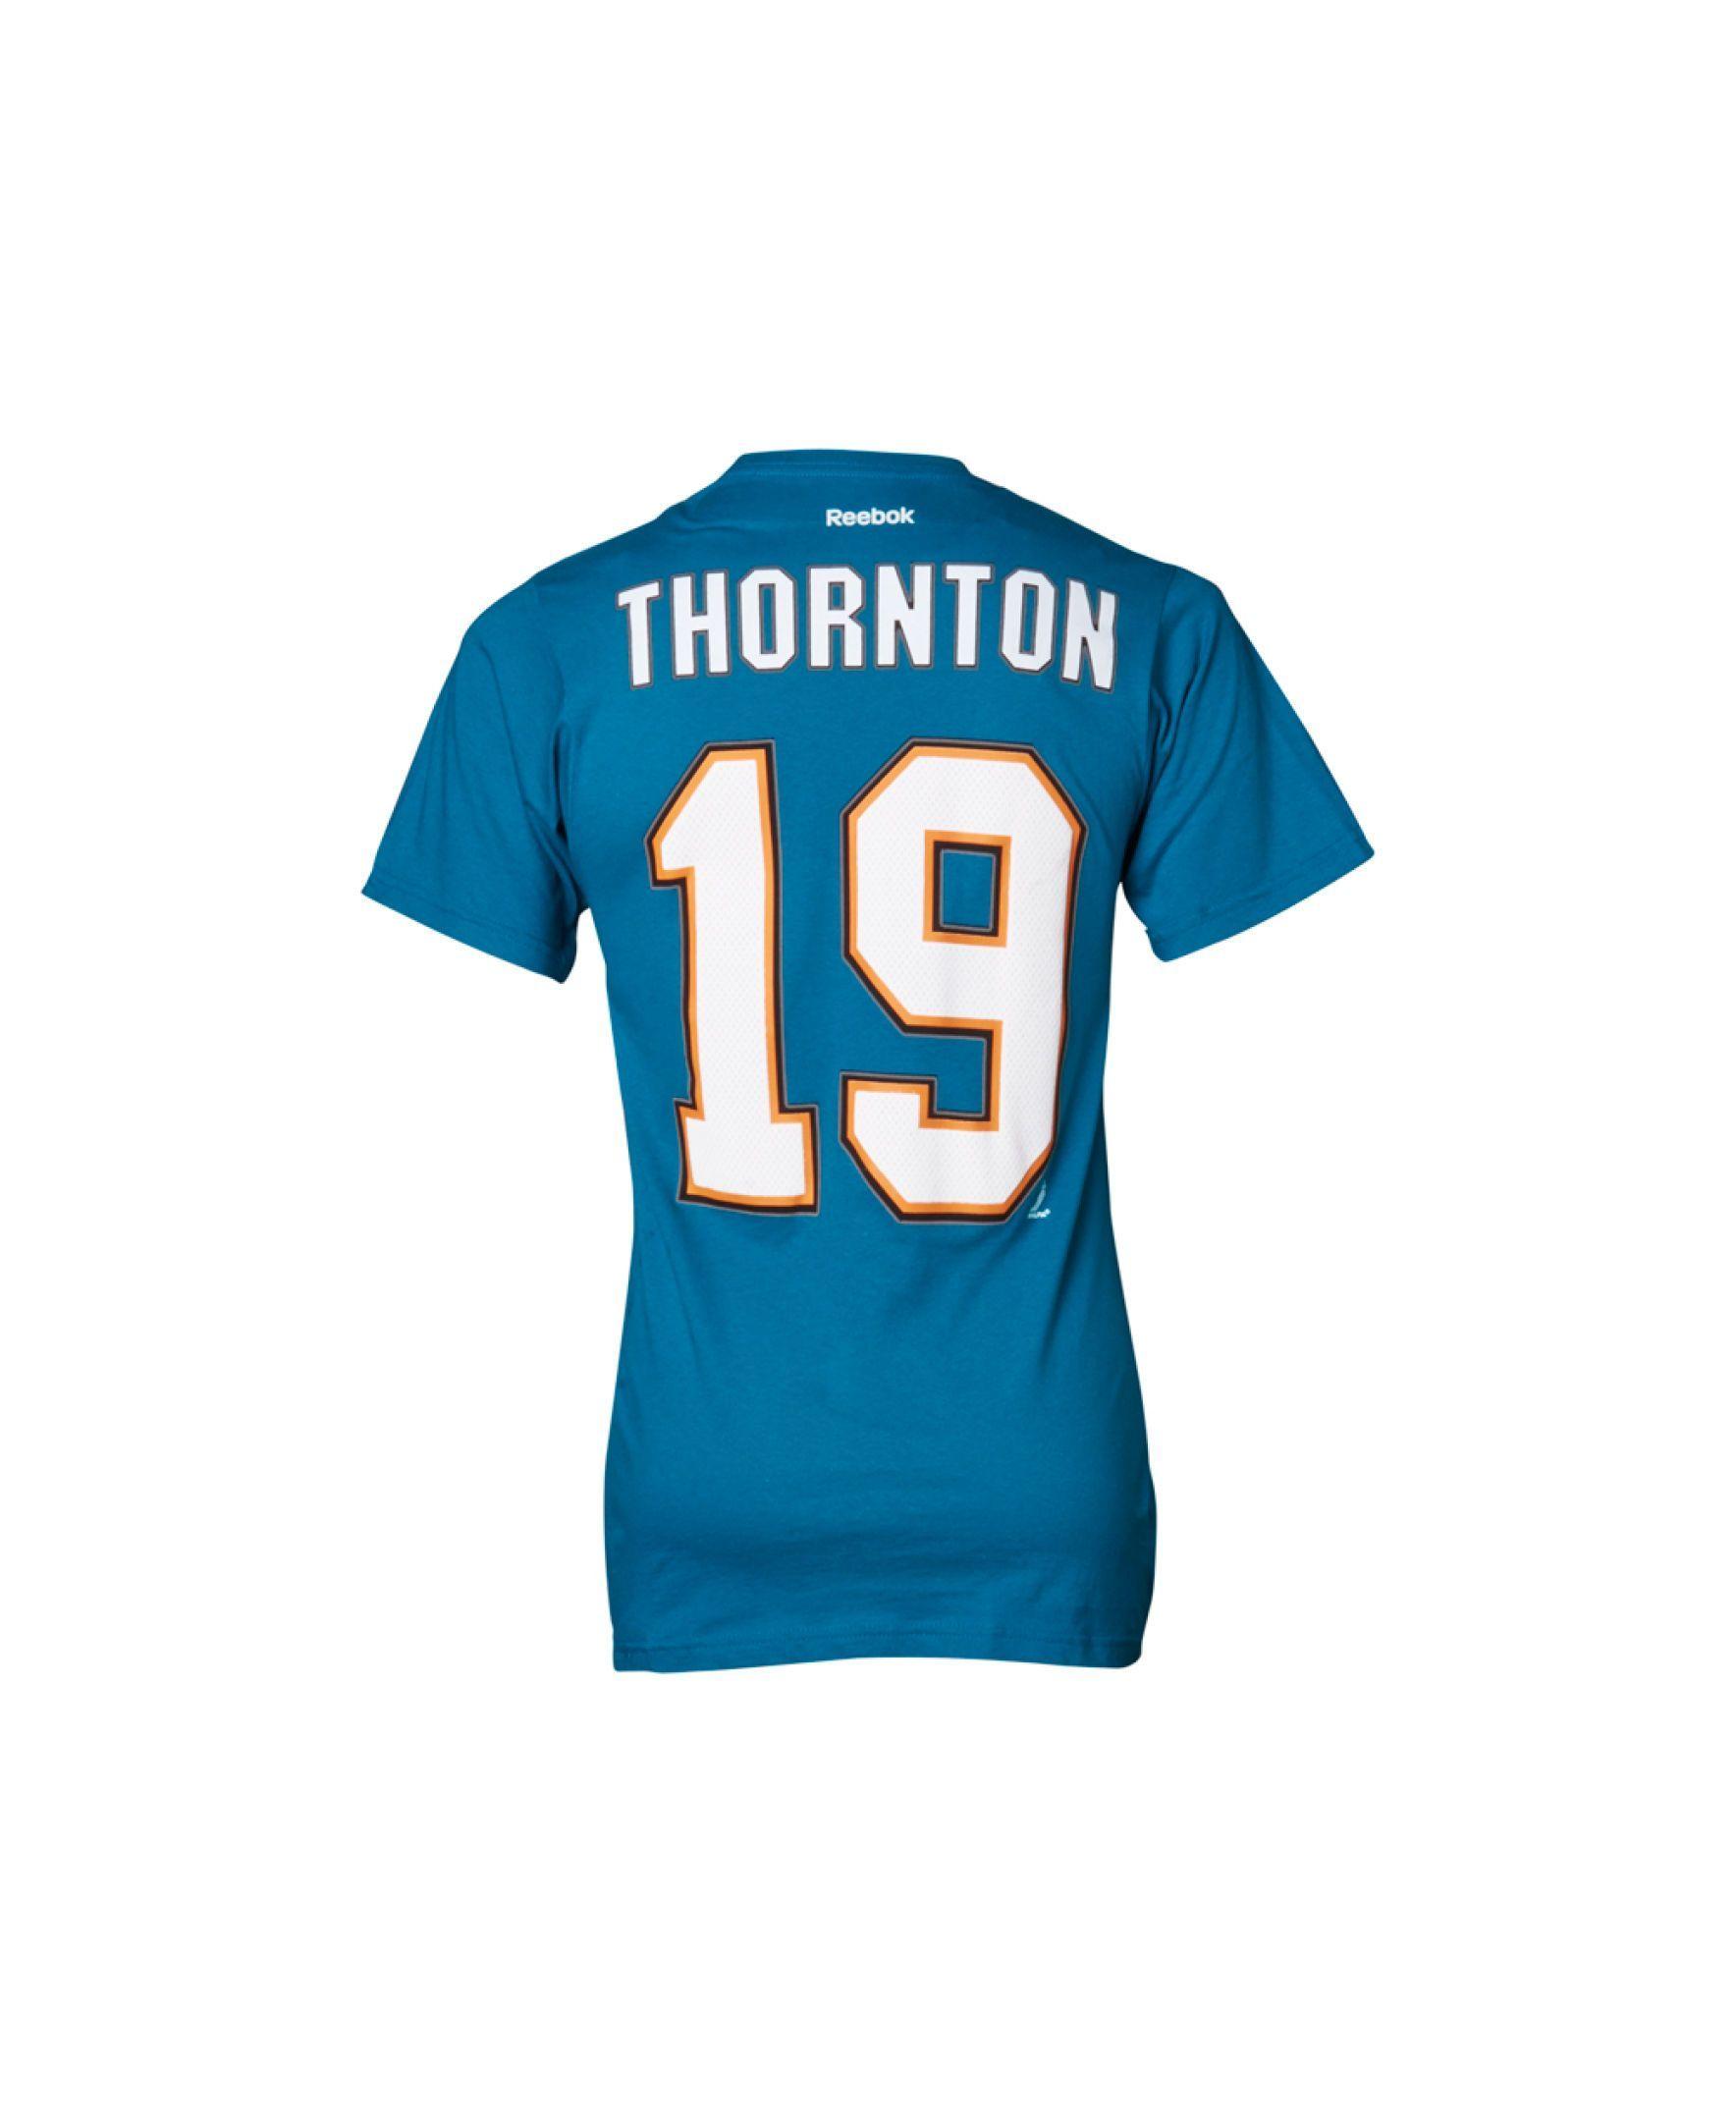 5c97010df06 Reebok Men's San Jose Sharks Joe Thornton Premier Player T-Shirt ...